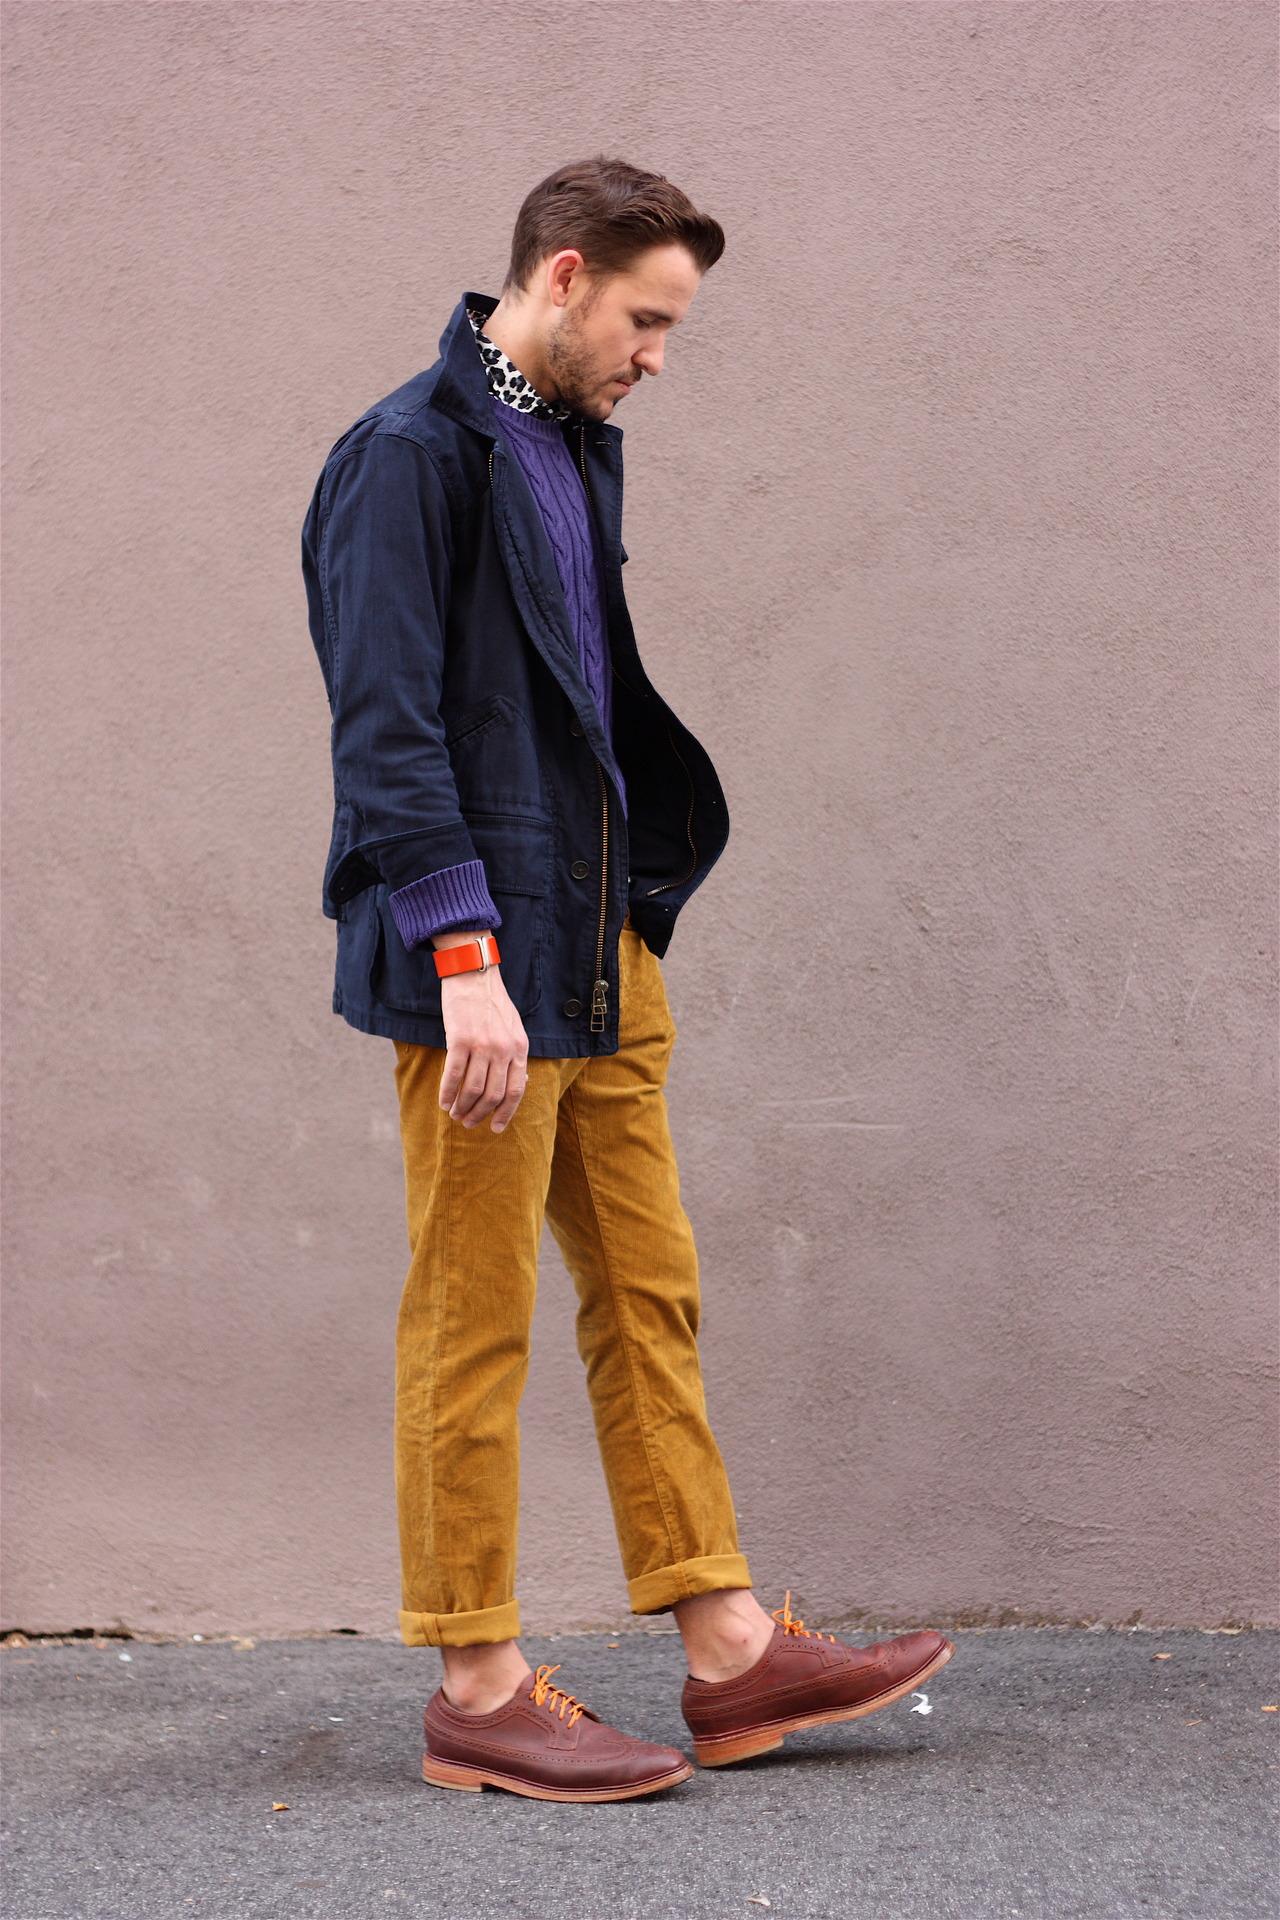 style-hipster-lookbook.jpg